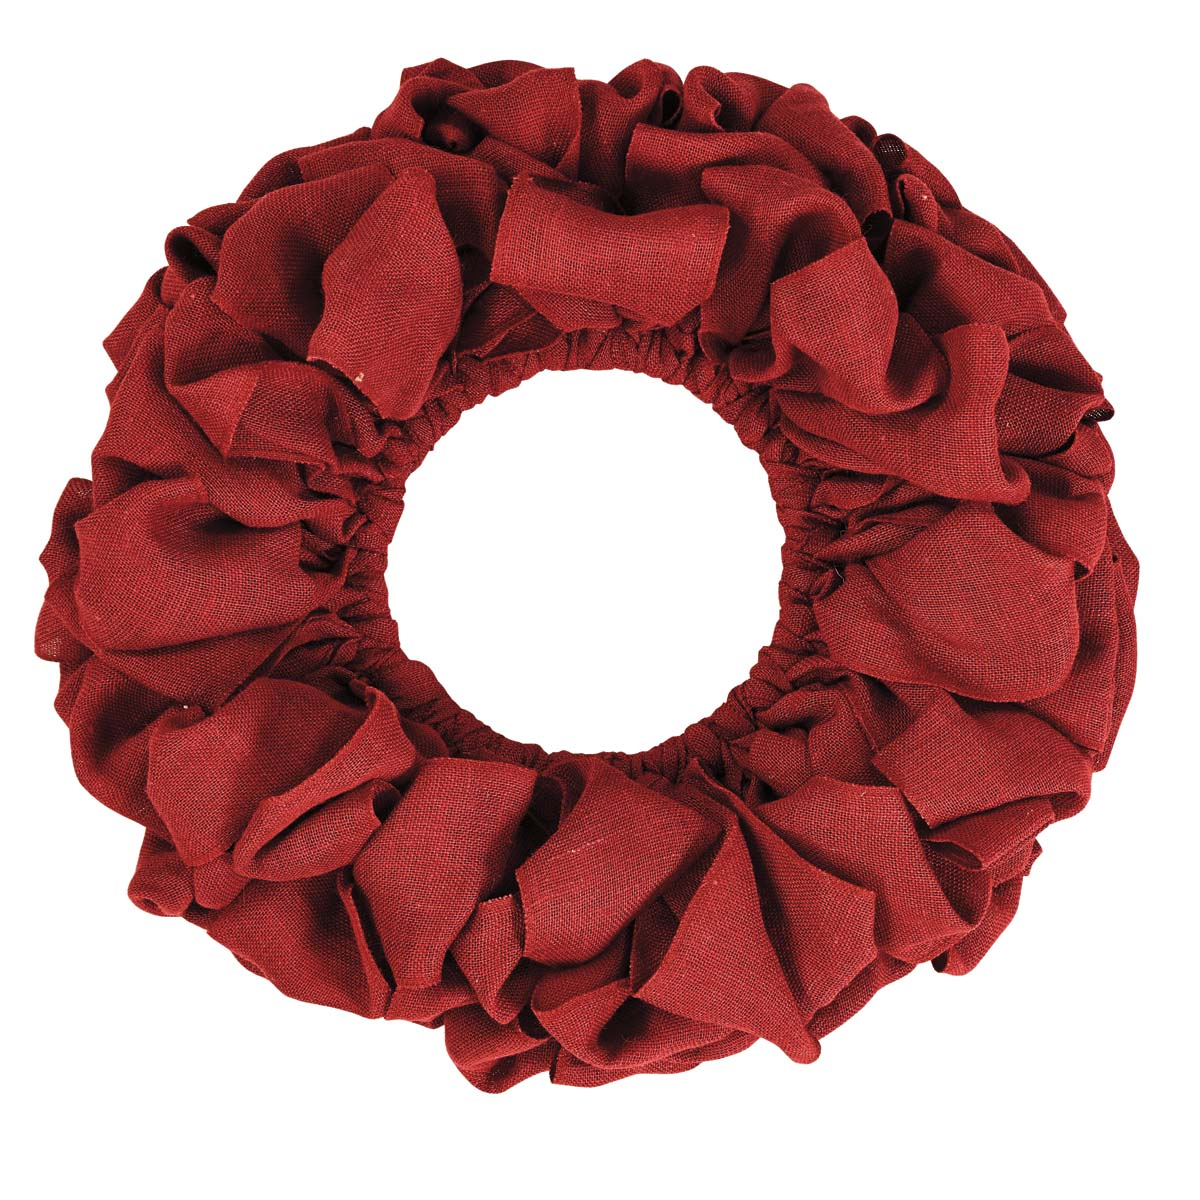 "Natural Tan Farmhouse Christmas Decor Burlap Wreath Twine Jute Metal Frame Round 15"" Diameter Wreath"